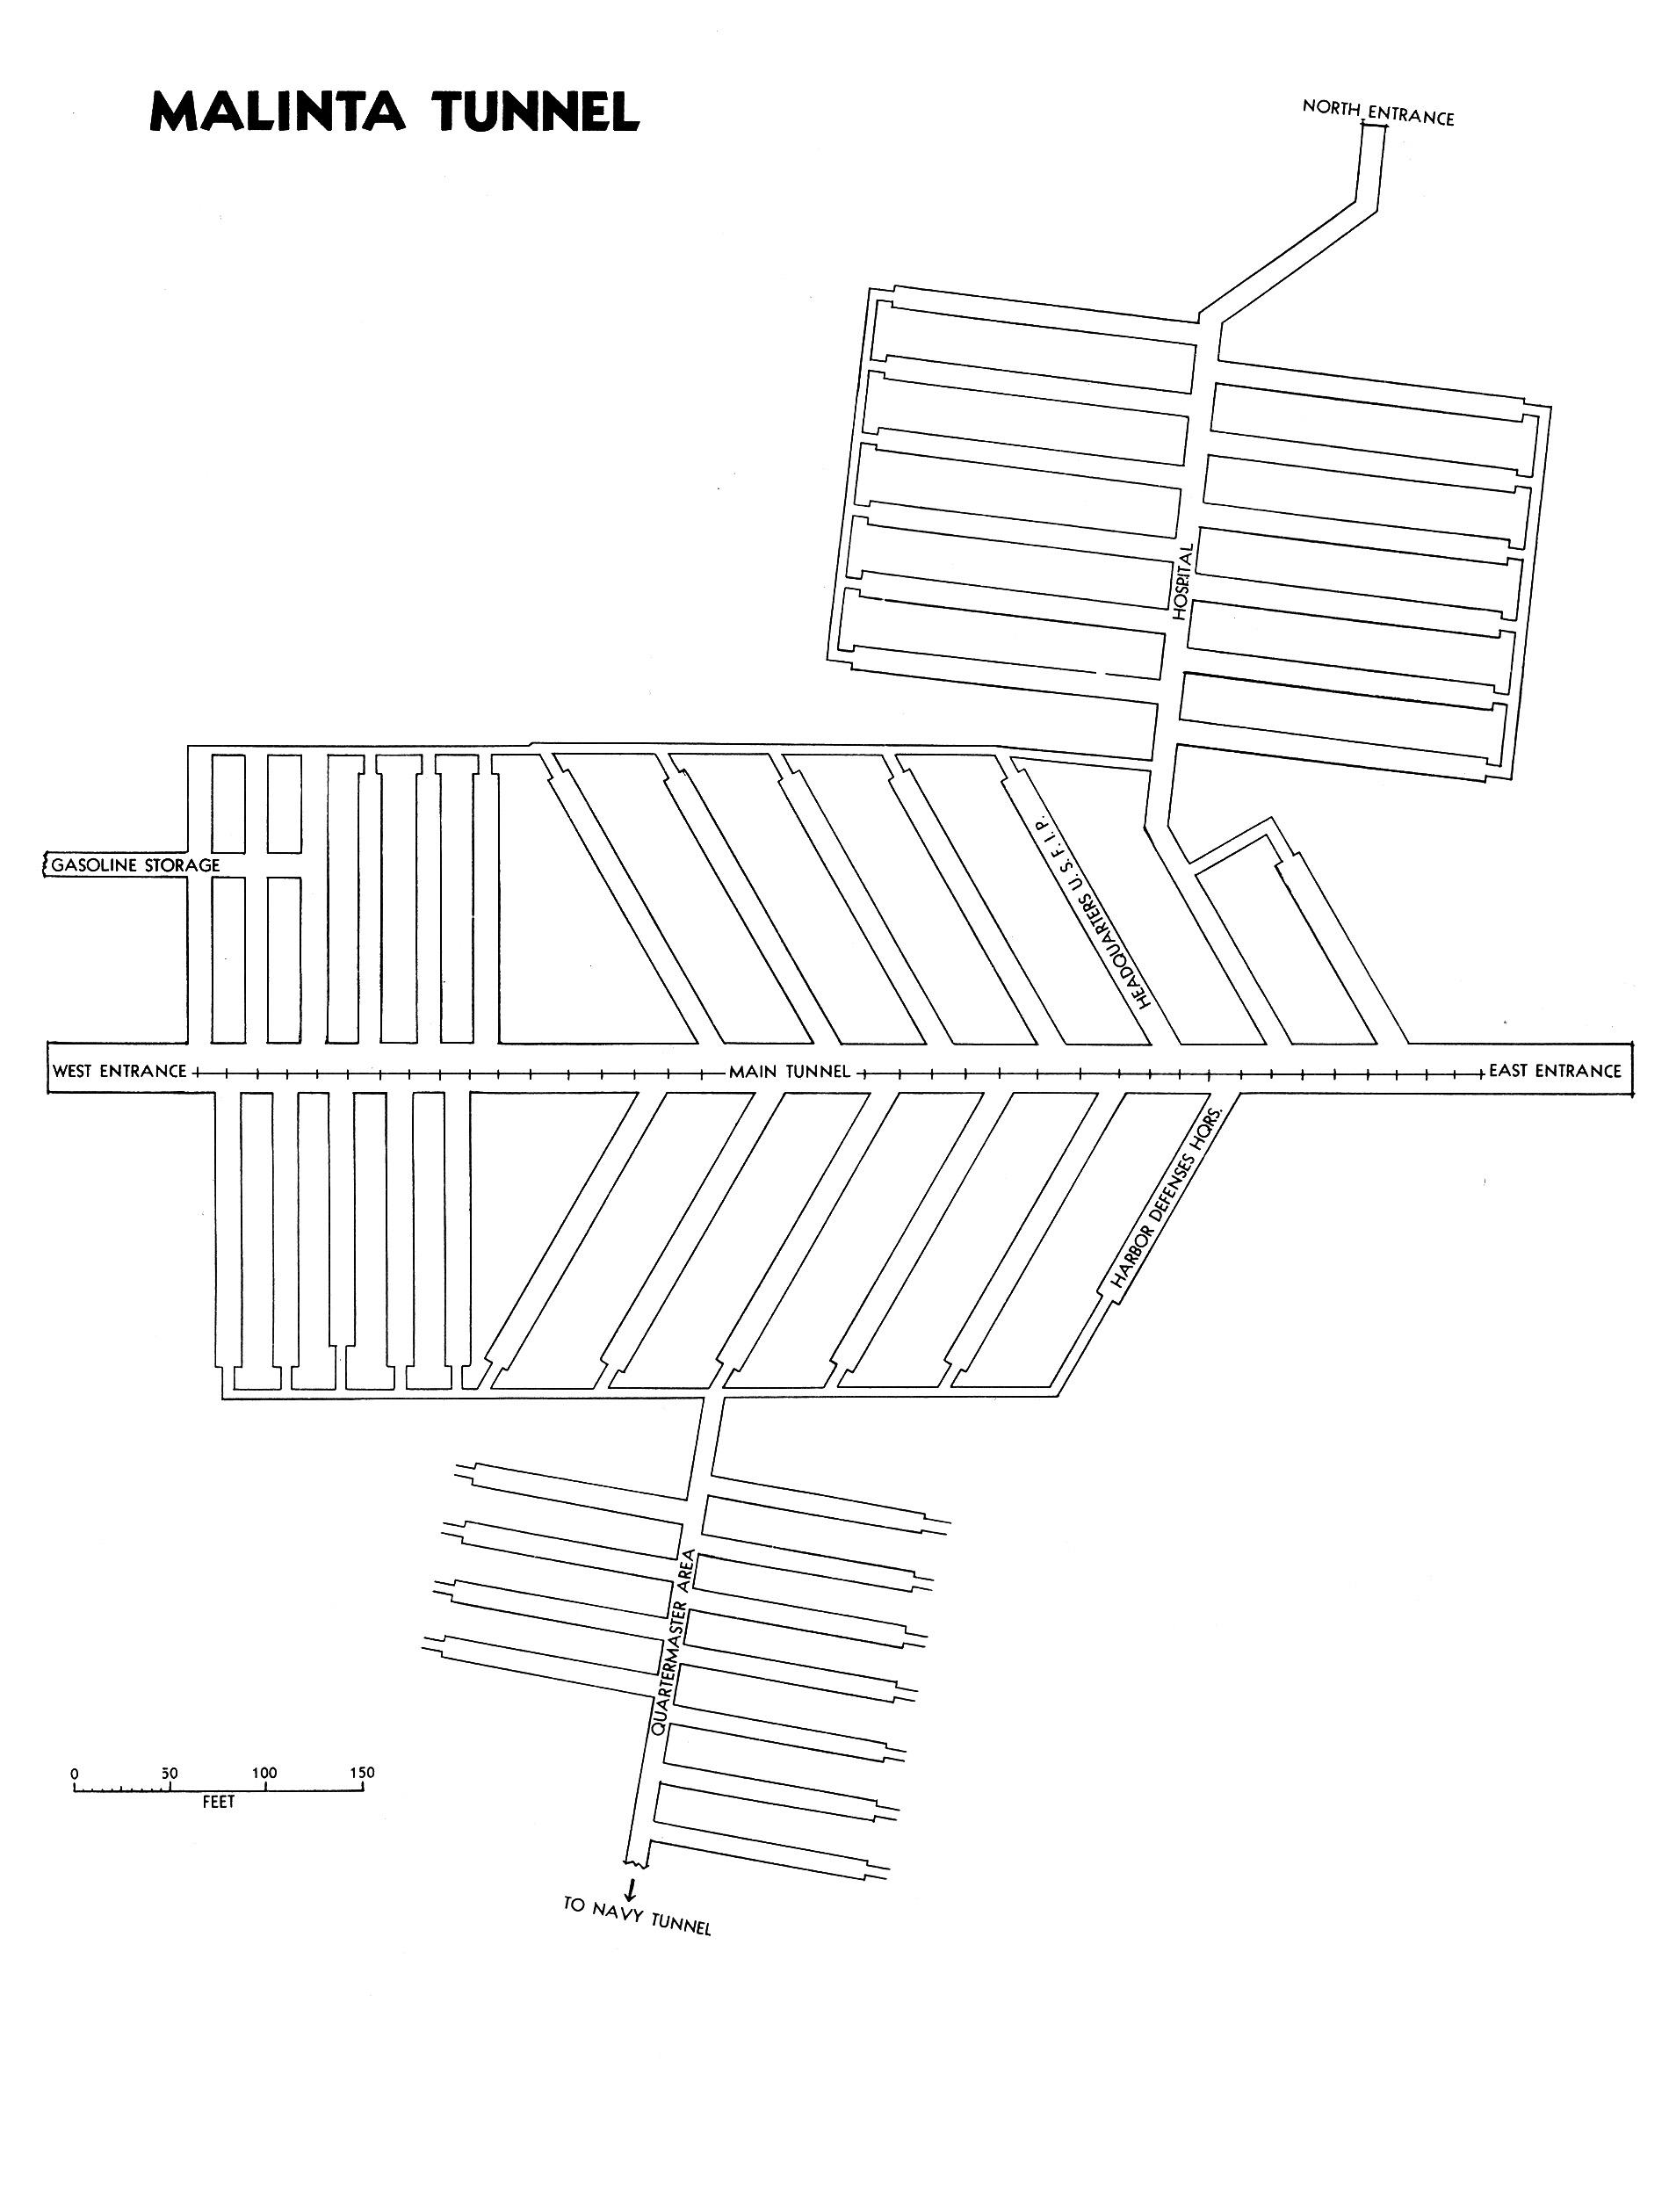 Malinta Tunnel Located File:malinta Tunnel Diagram